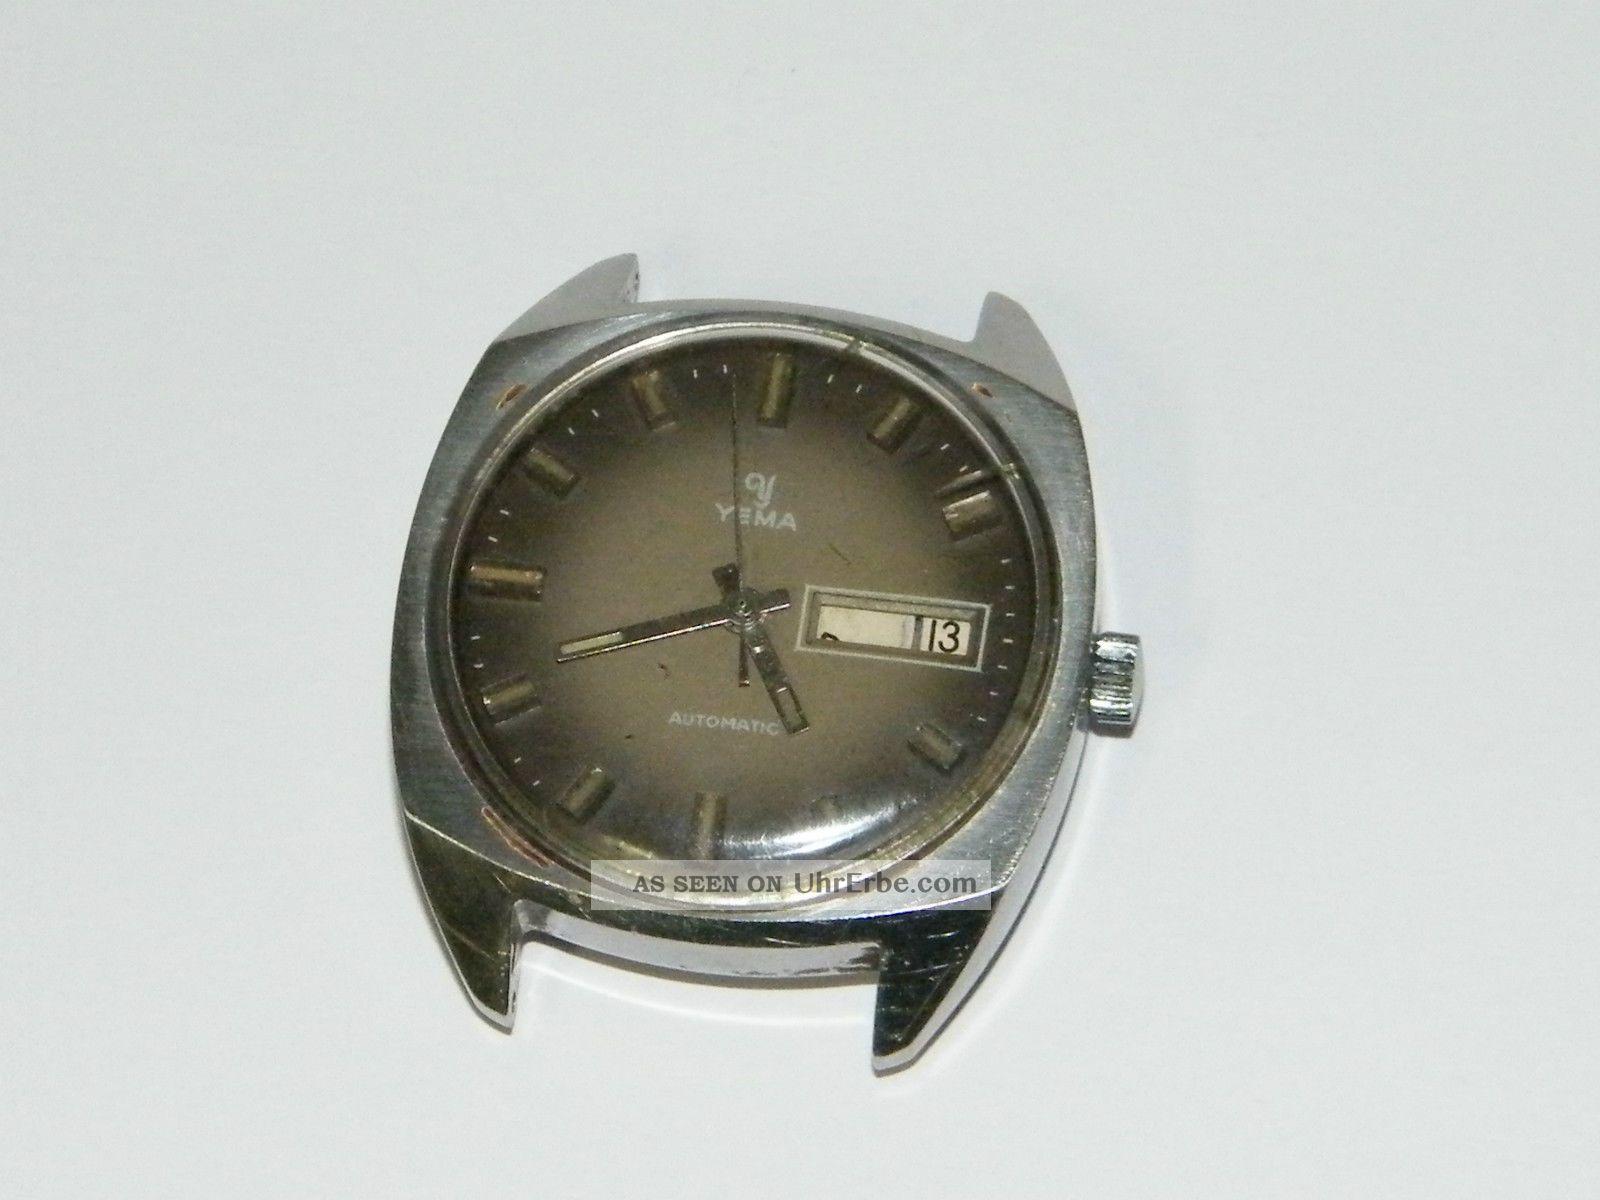 Yema Automatic,  Ebauche Bettlach,  Hau Wrist Watch,  Montre,  Repair,  Läuft Armbanduhren Bild